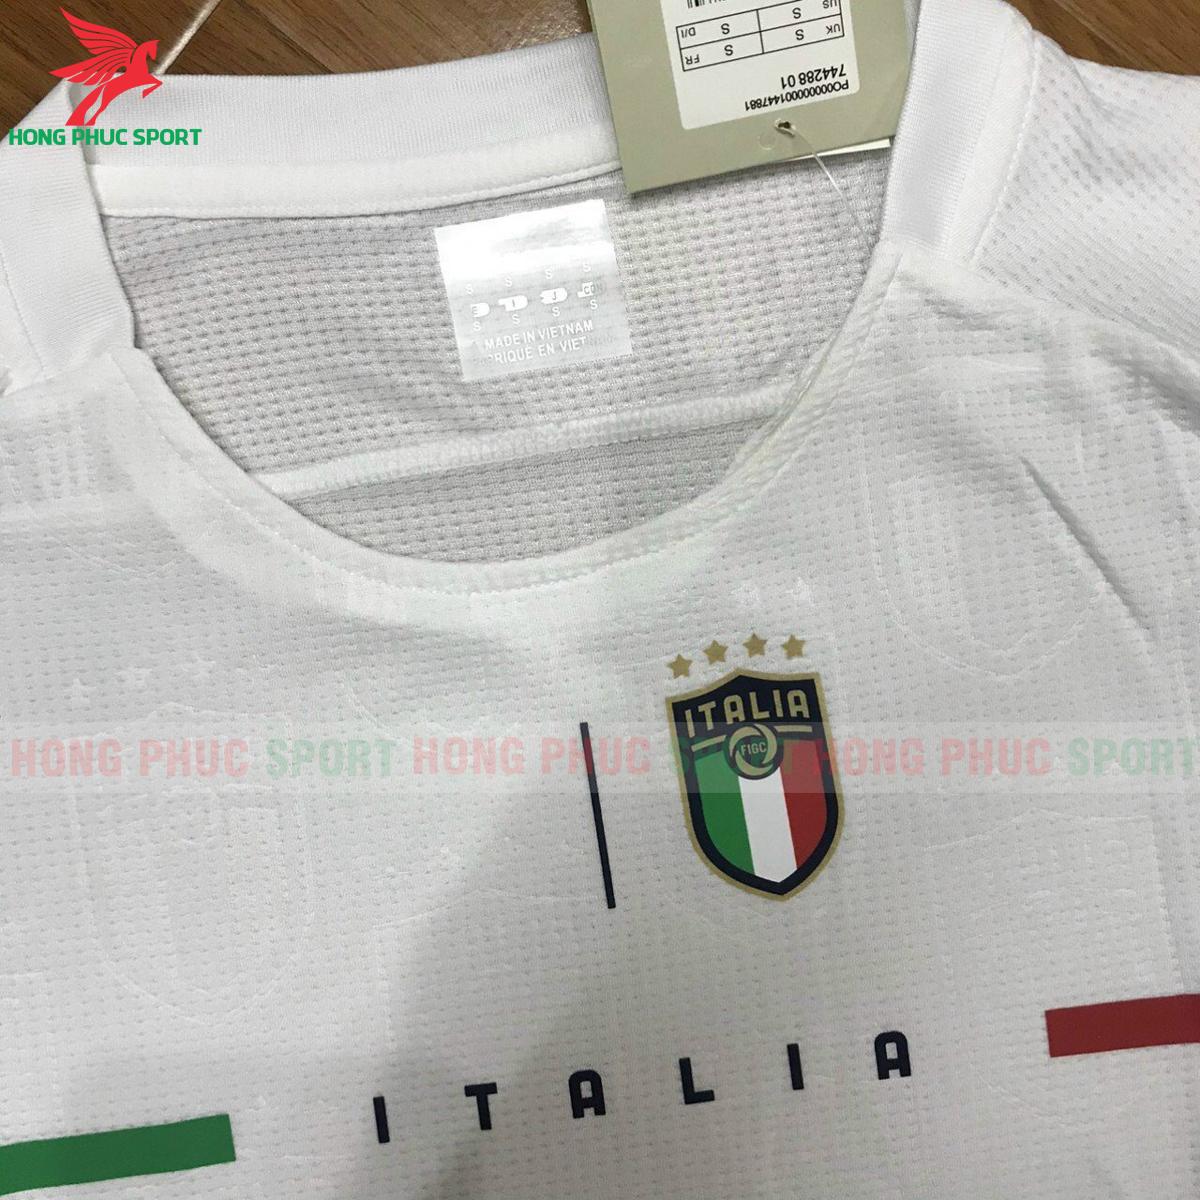 https://cdn.hongphucsport.com/unsafe/s4.shopbay.vn/files/285/ao-tuyen-italia-2021-2022-san-khach-3-60bf4c3930e6b.png